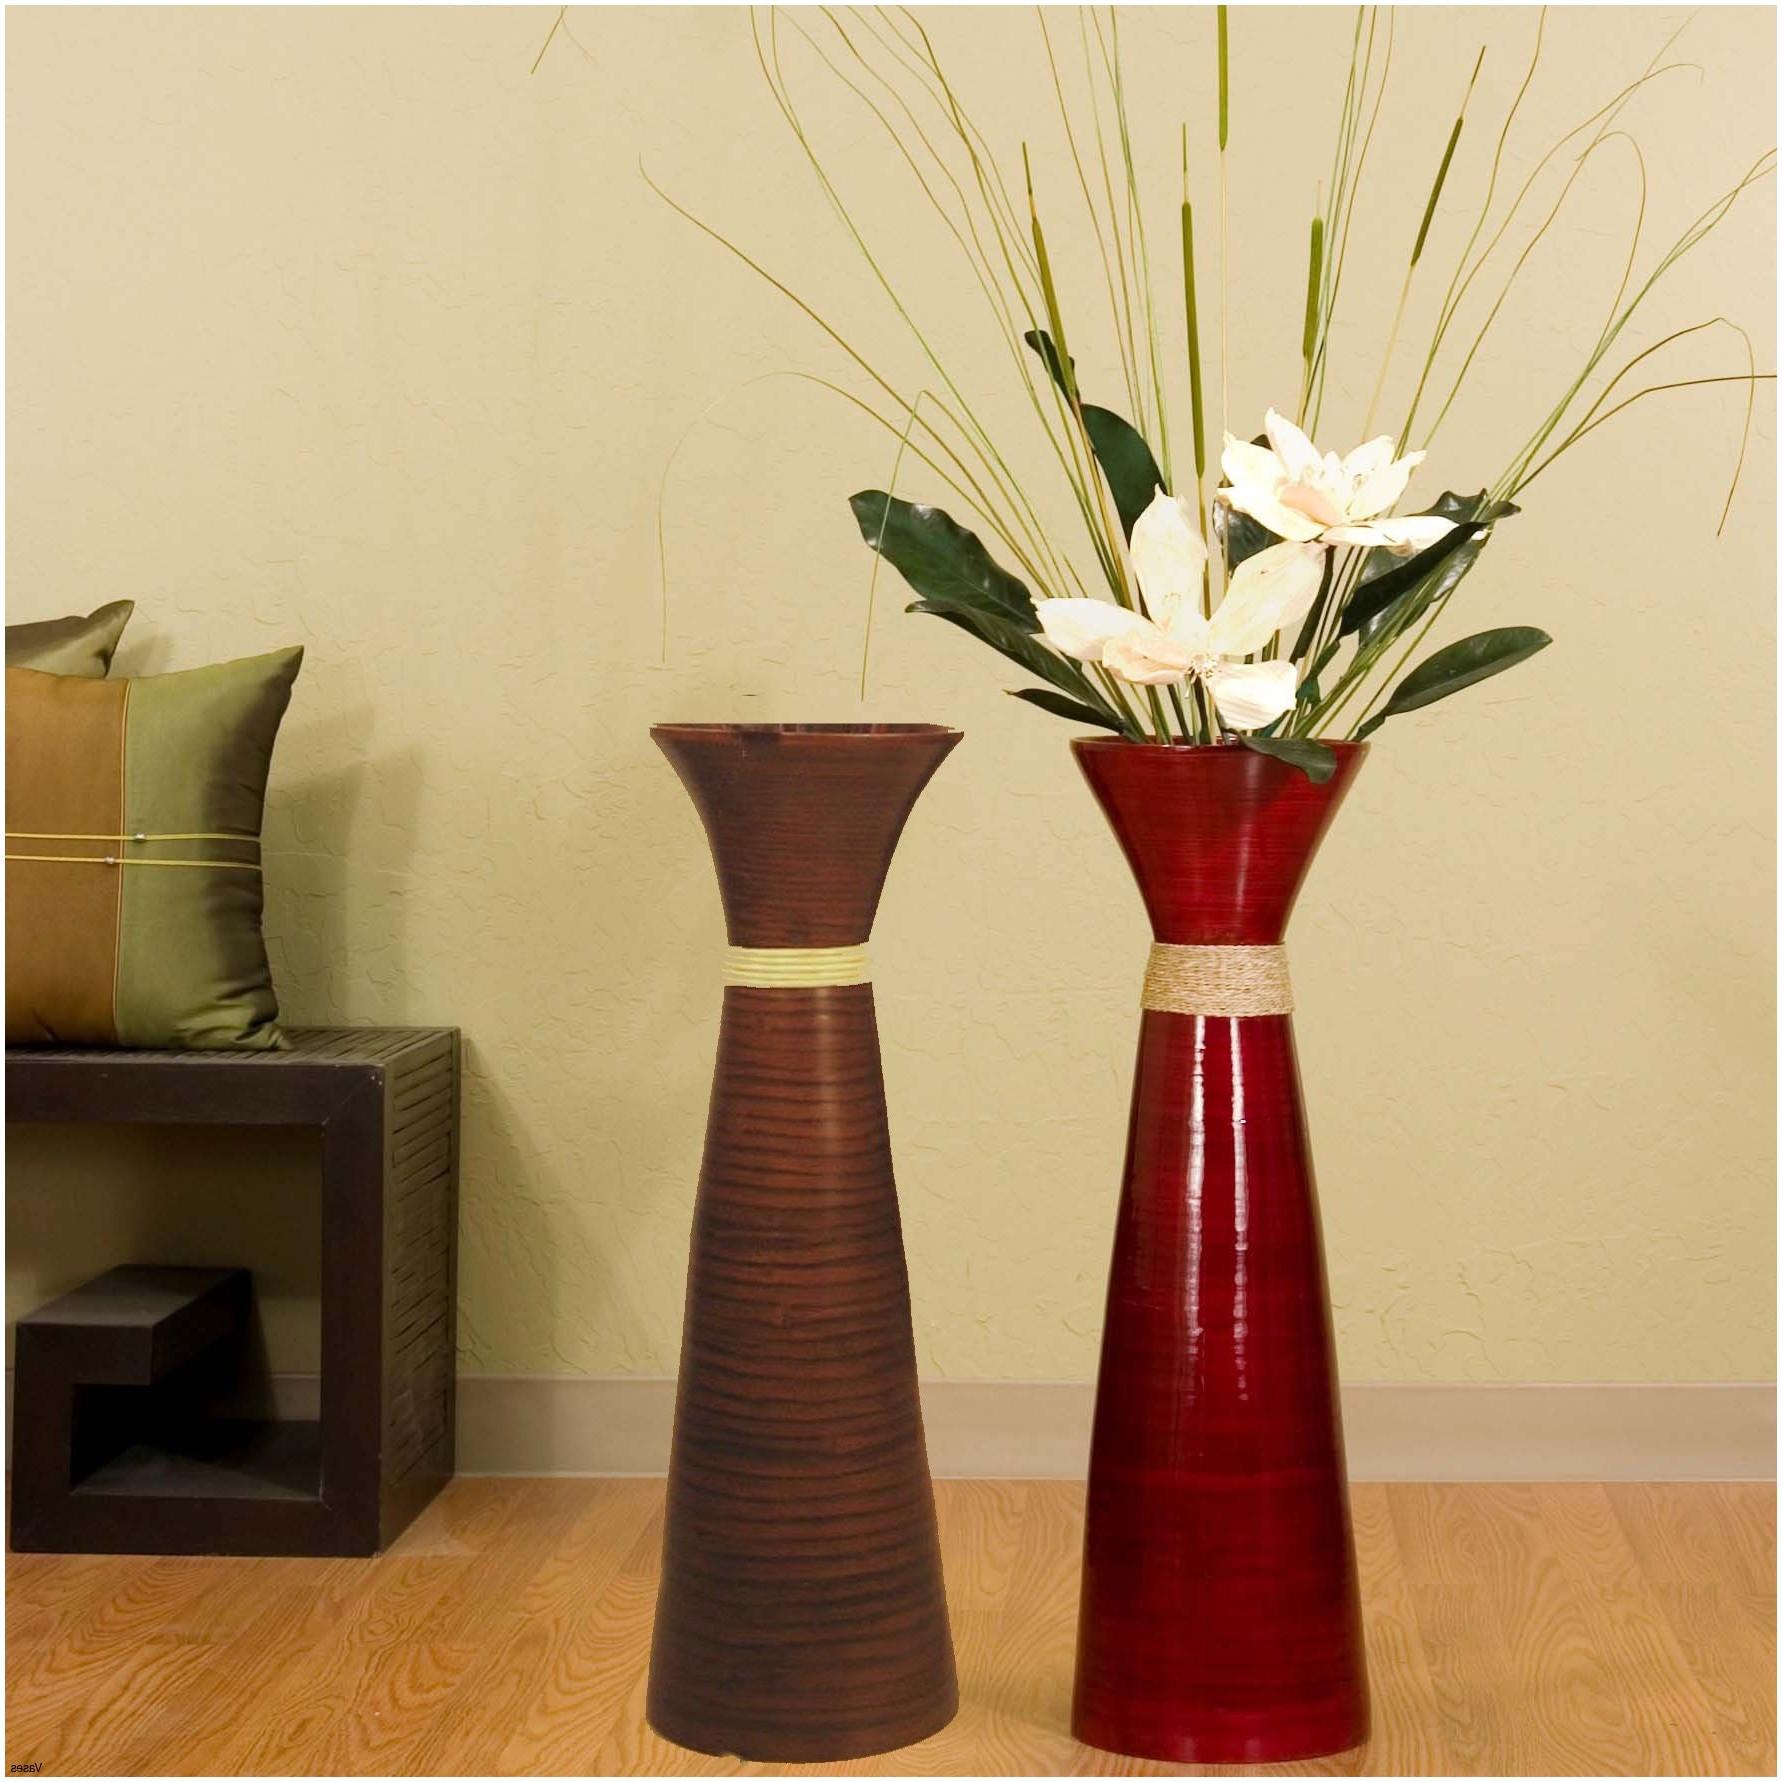 Wholesale Floor Vases Of Red Decorative Vases Photograph Living Room Floor Vase Best H Vases In Red Decorative Vases Pics 21 Beau Decorative Vases Anciendemutu Of Red Decorative Vases Photograph Living Room